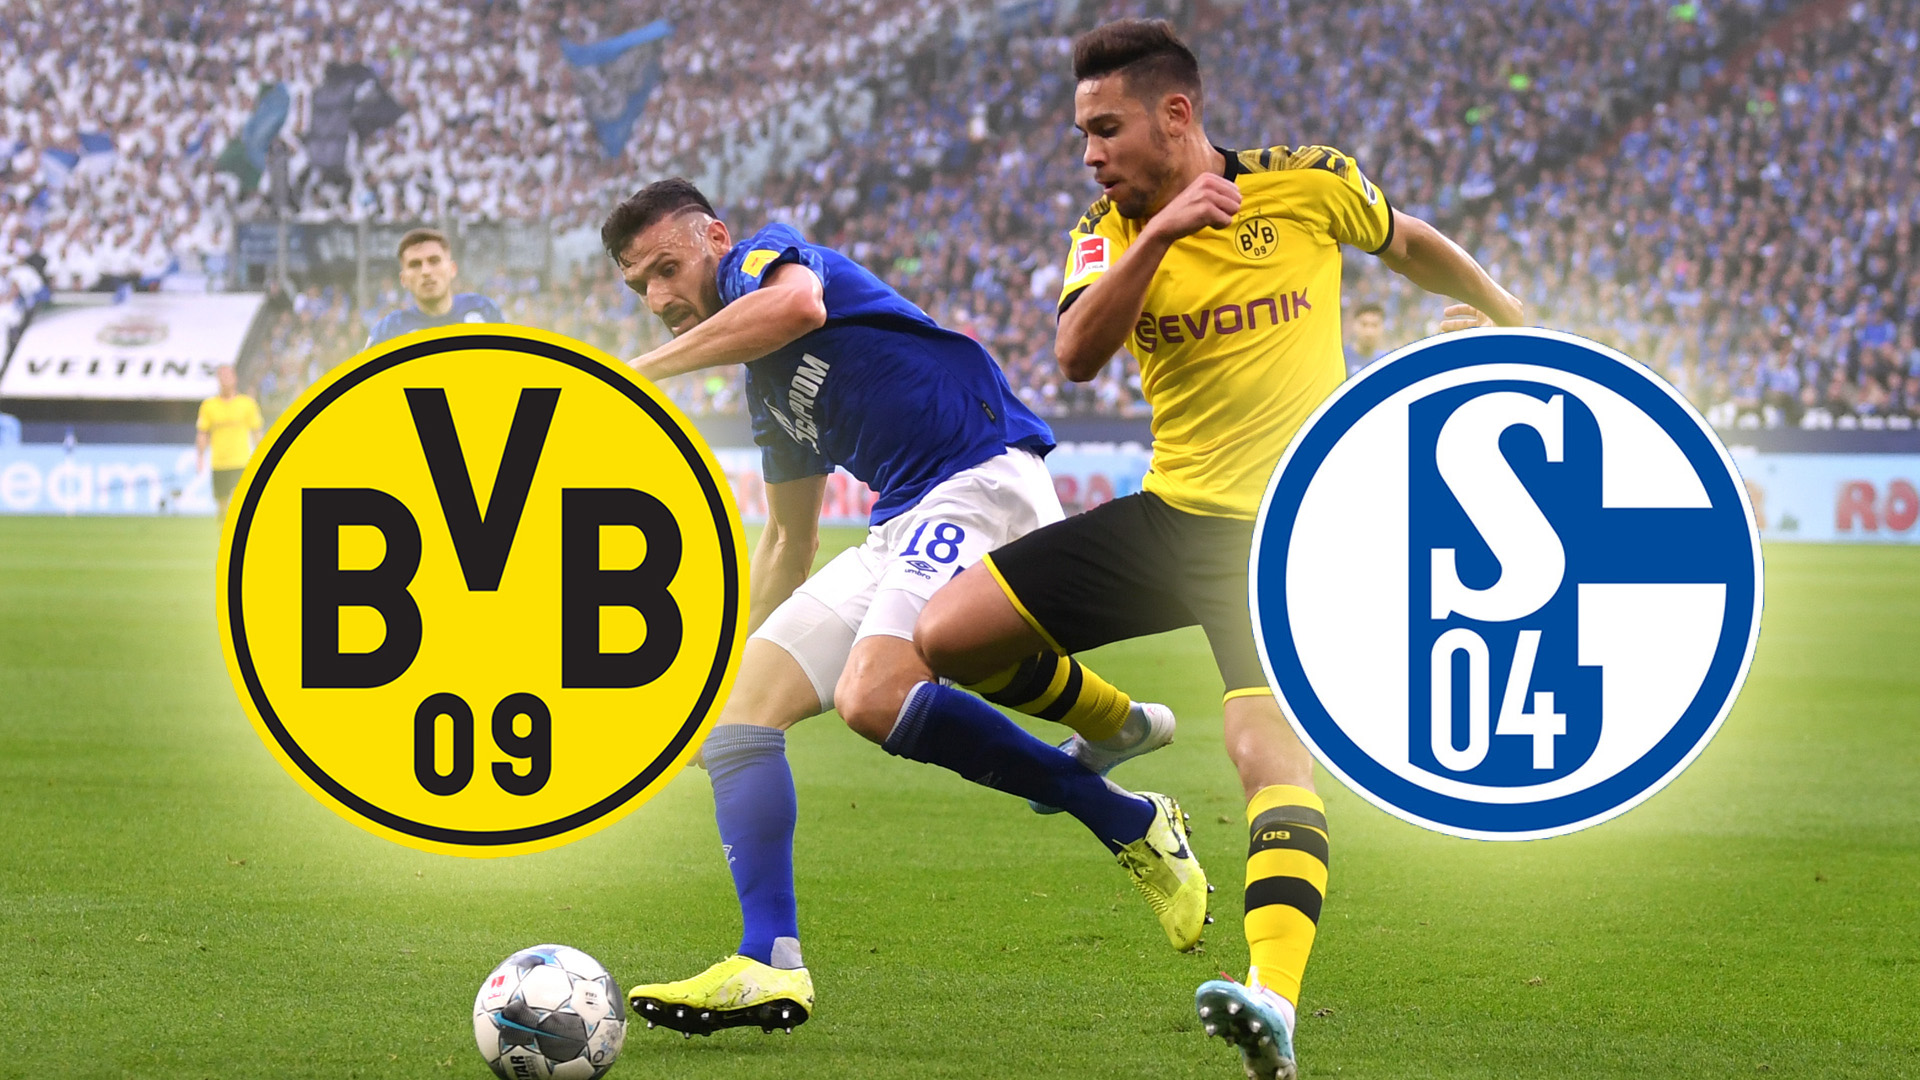 Gegen Wen Spielt Schalke Heute